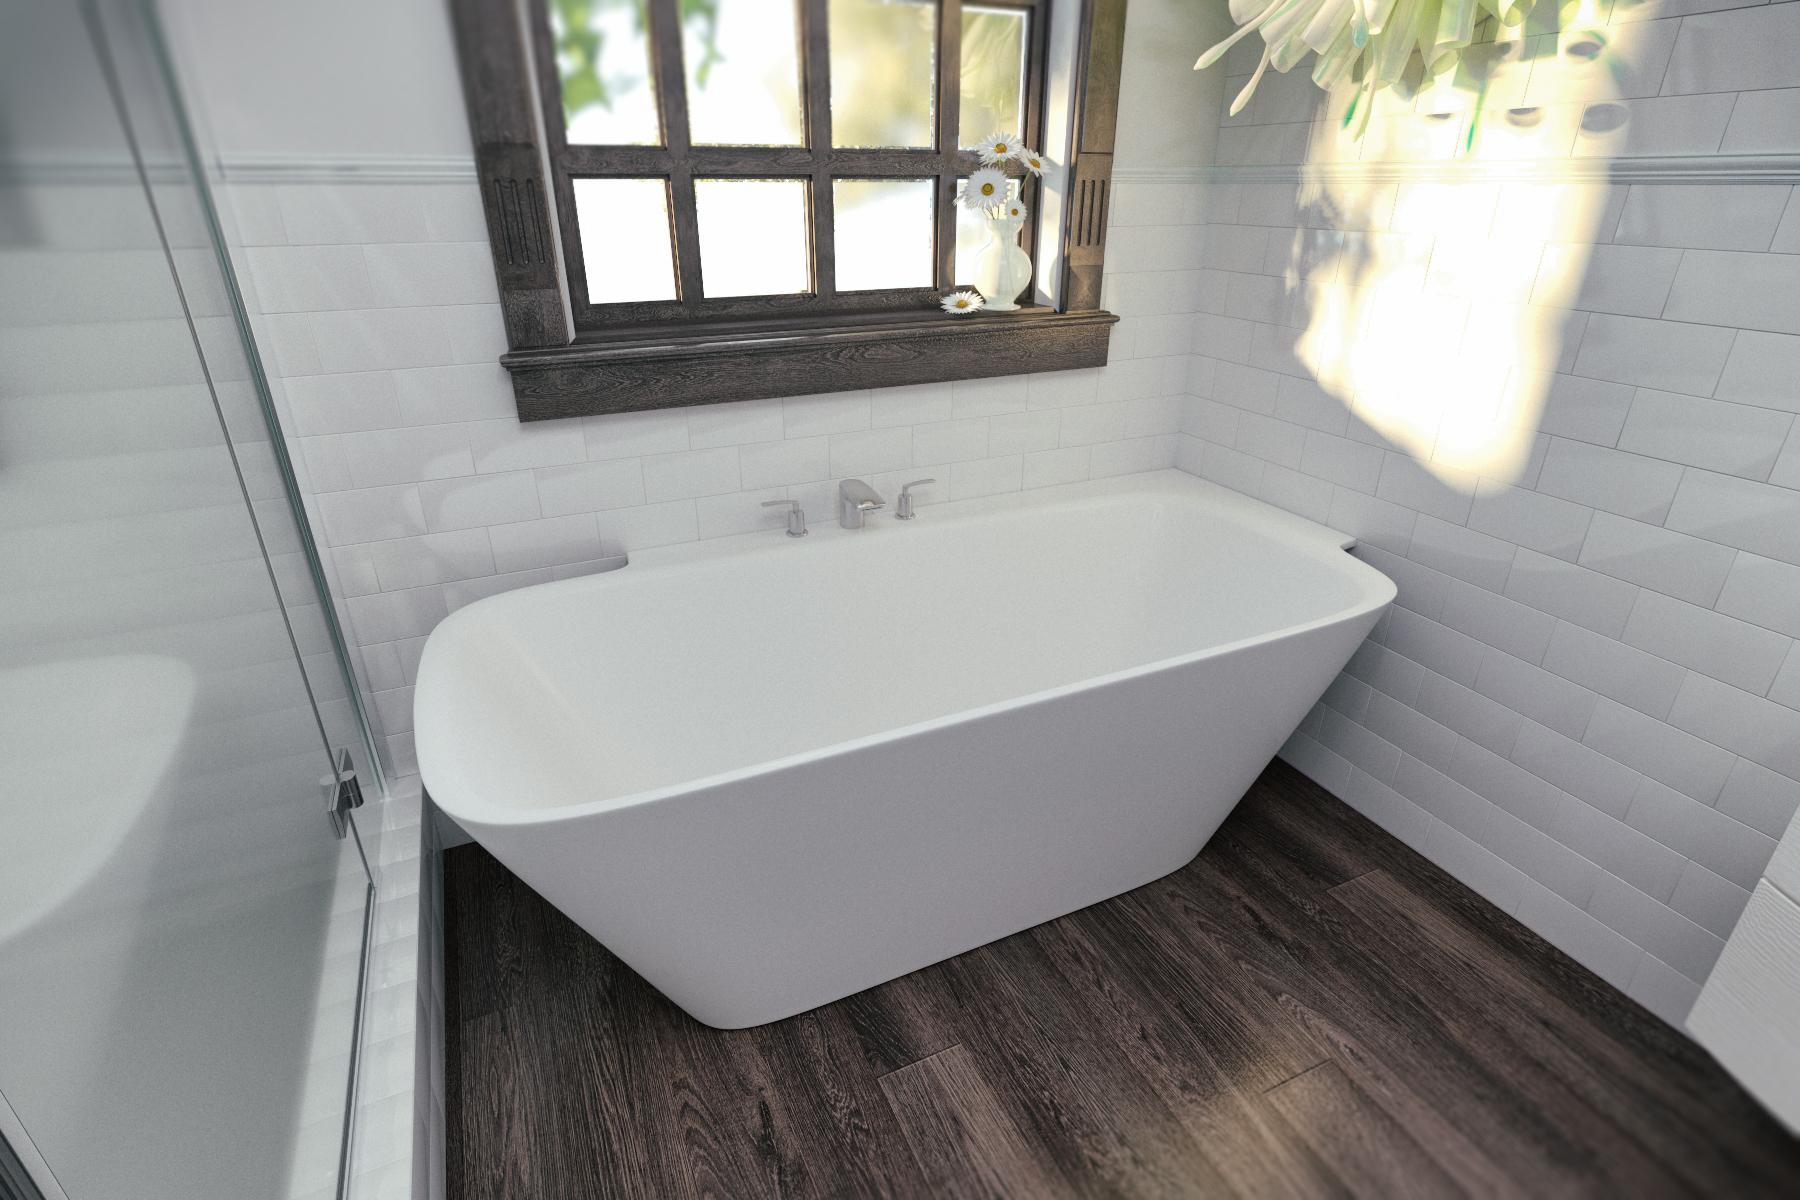 Arabella L Wht Corner Solid Surface Bathtub (3)